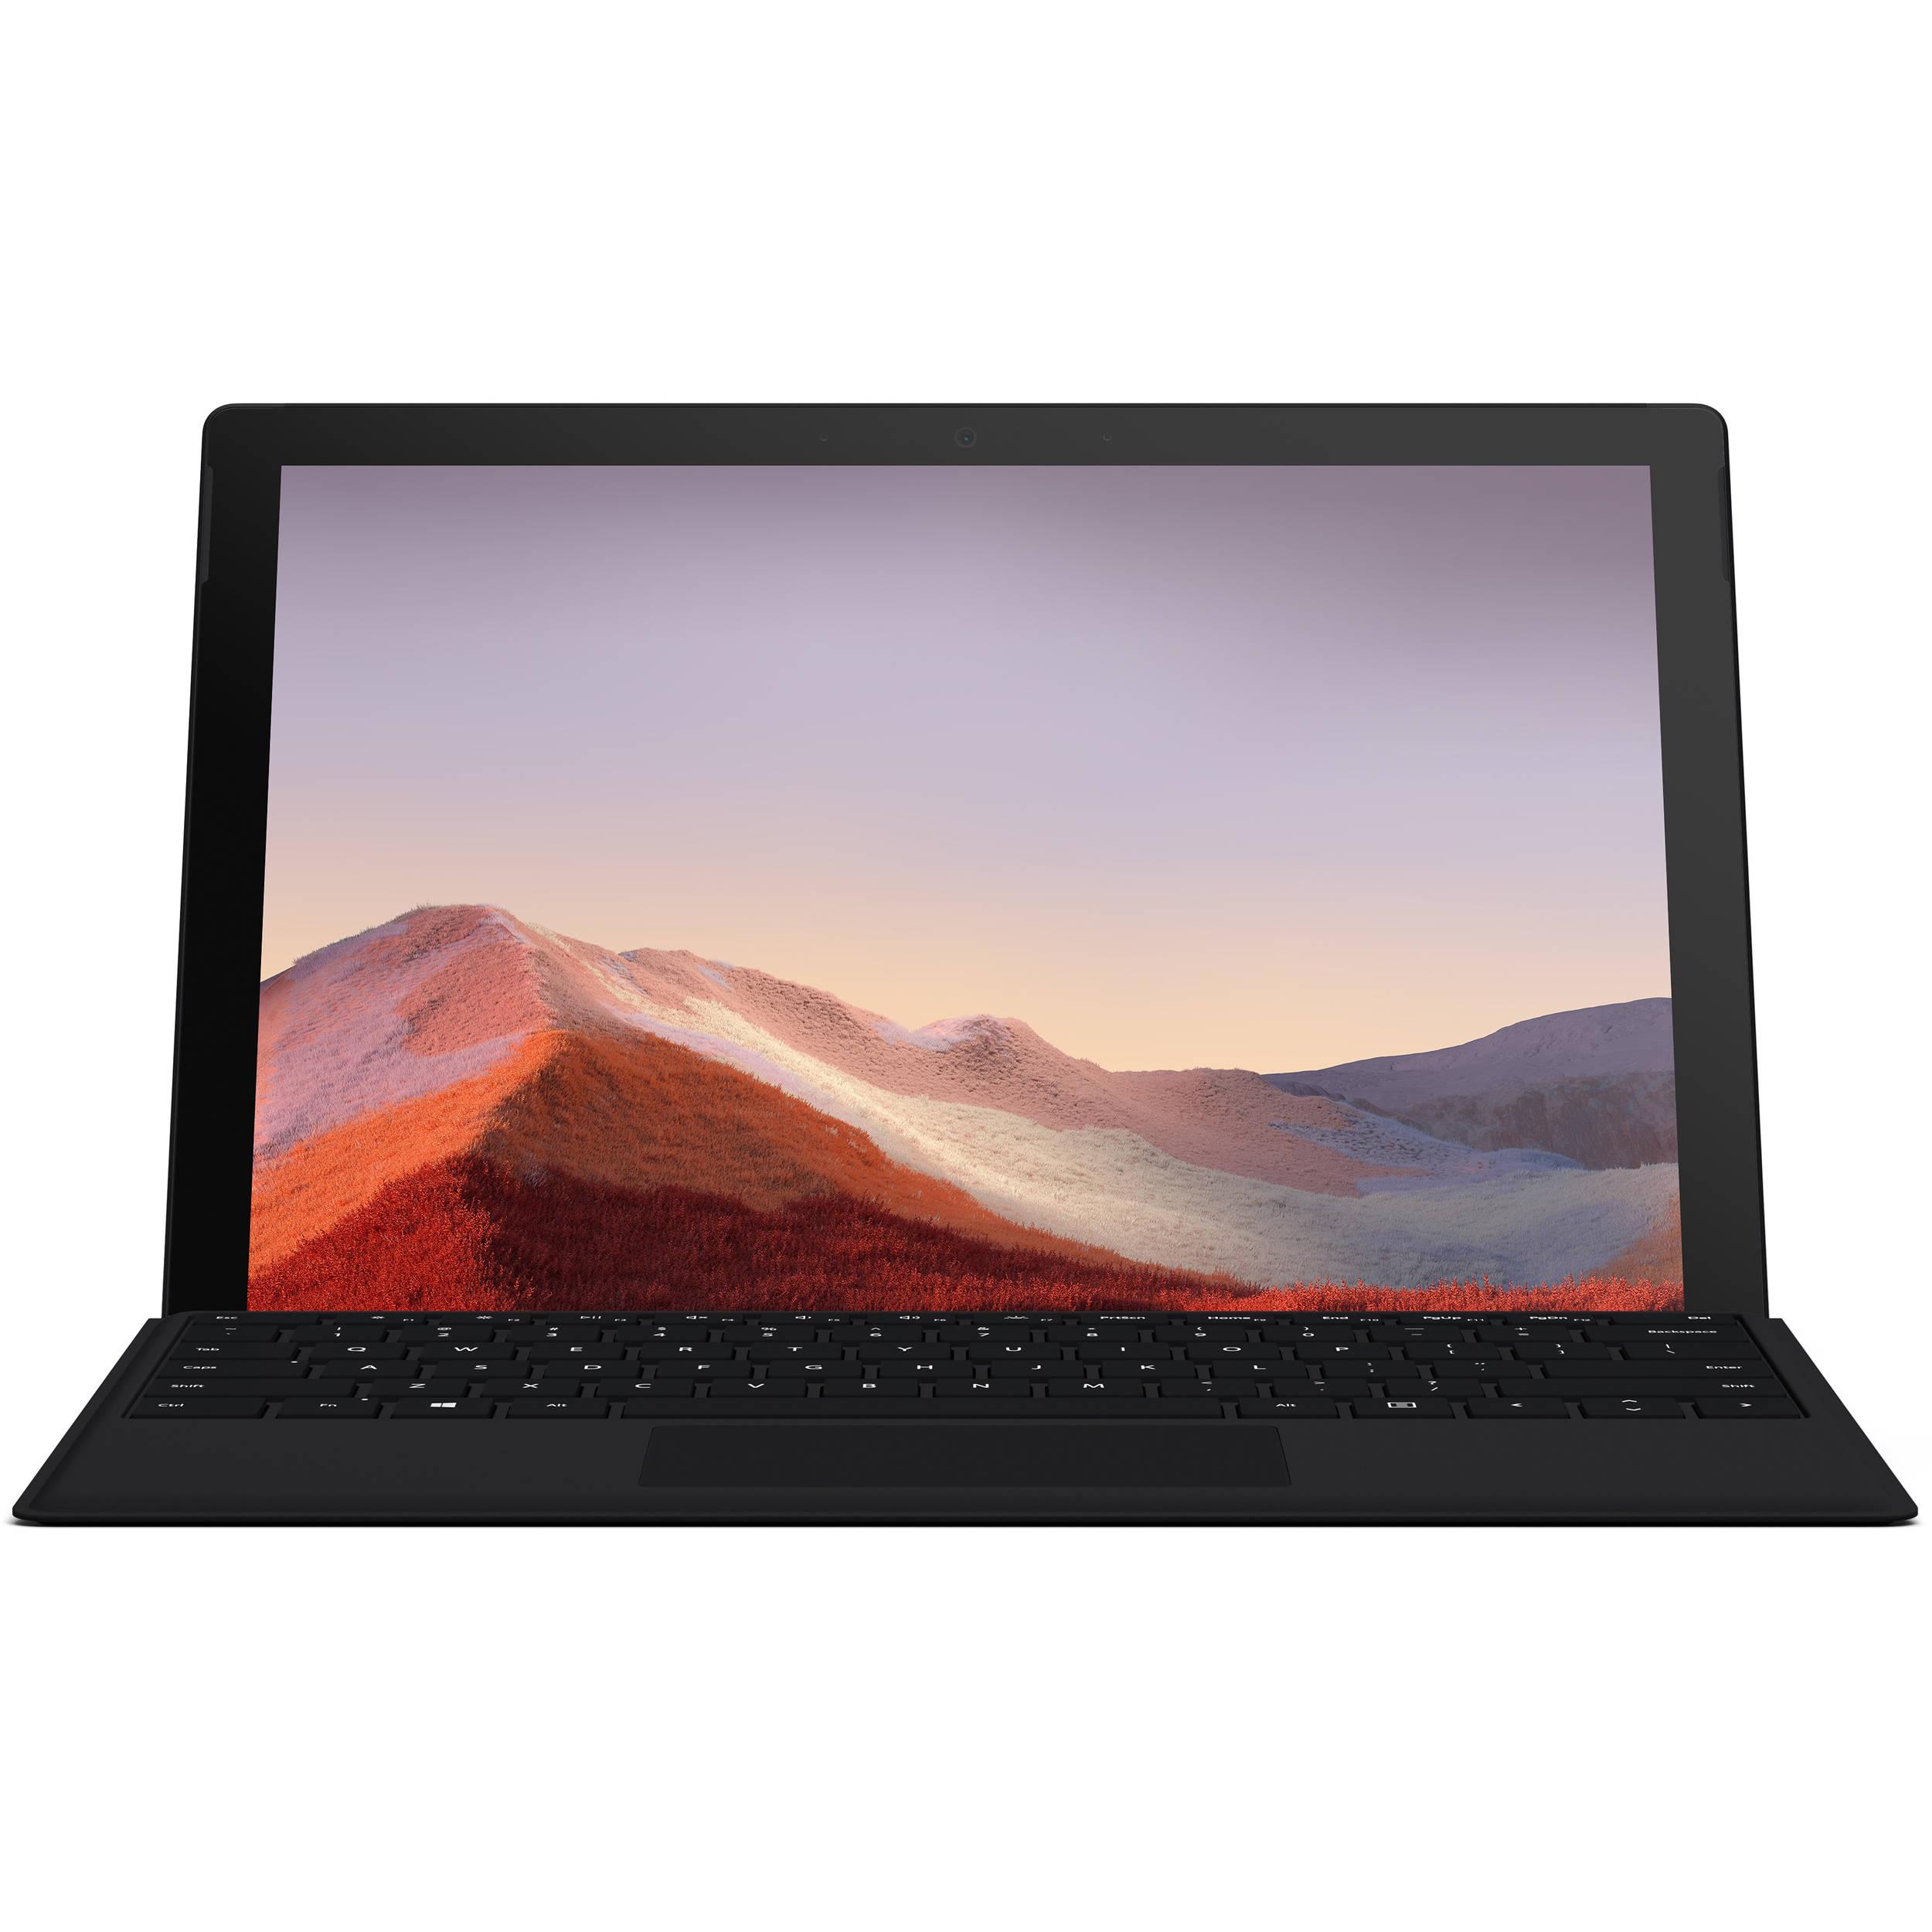 تبلت مایکروسافت مدل Surface Pro 7 - F به همراه کیبورد Black Type Cover